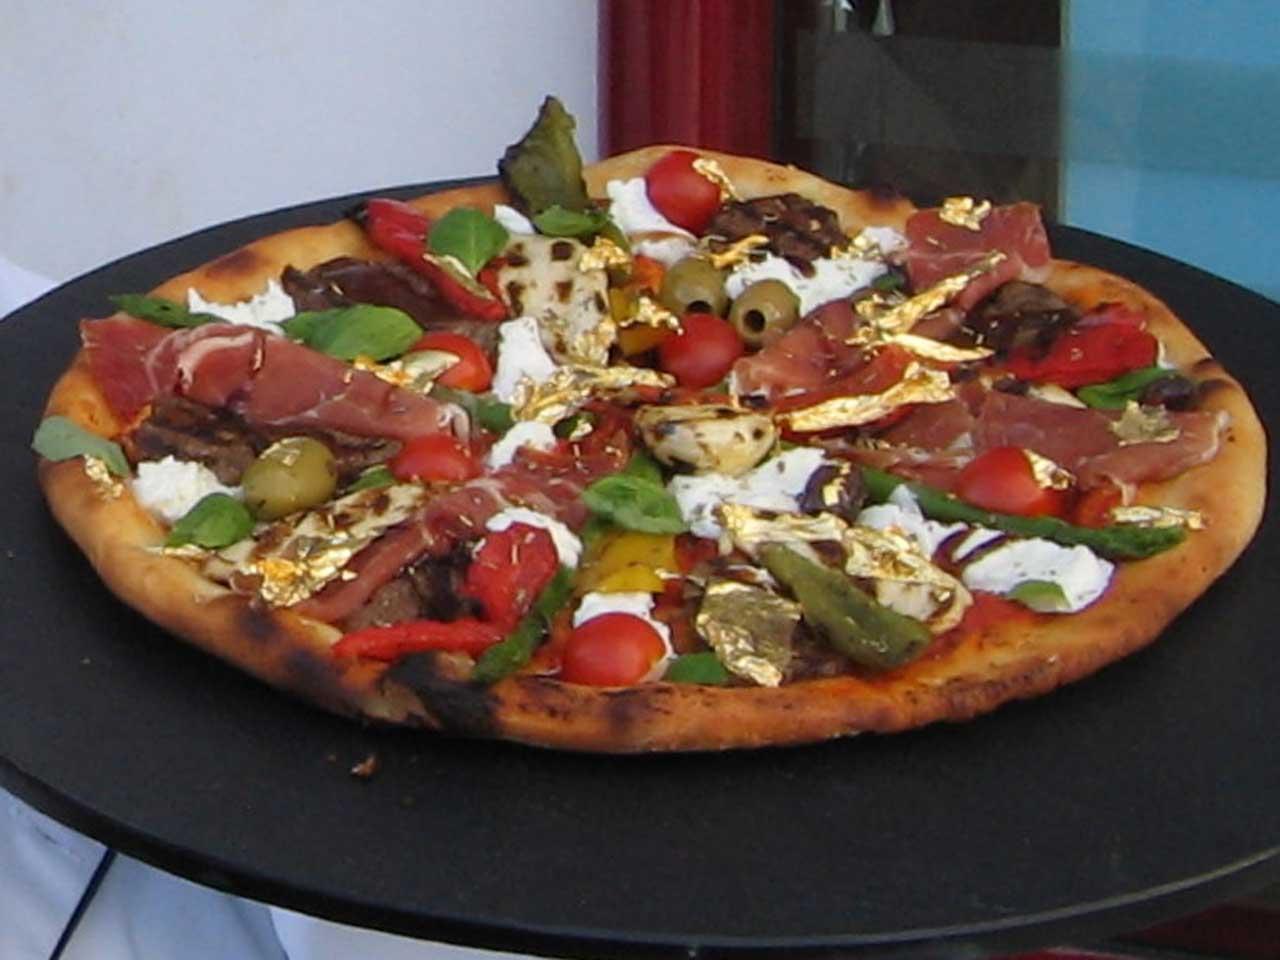 Pizza Royale 007, $4,200